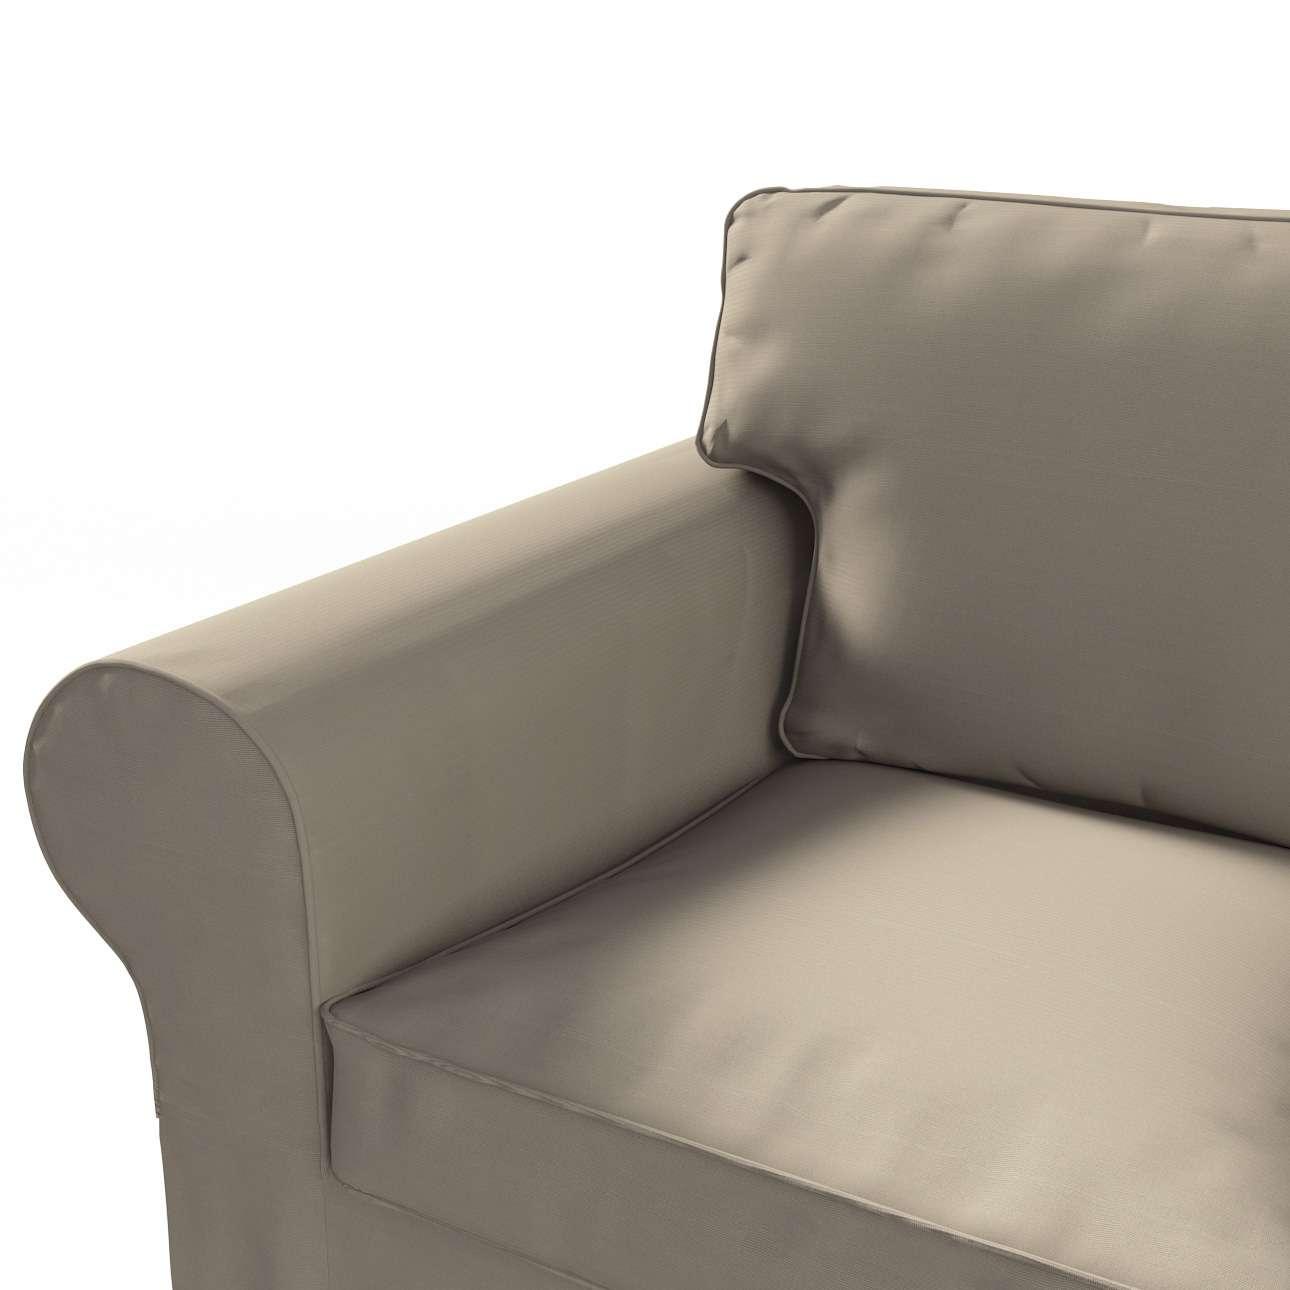 Ektorp 3-Sitzer Schlafsofabezug, ALTES Modell Sofahusse Ektorp 3-Sitzer Schlafsofa von der Kollektion Cotton Panama, Stoff: 702-28